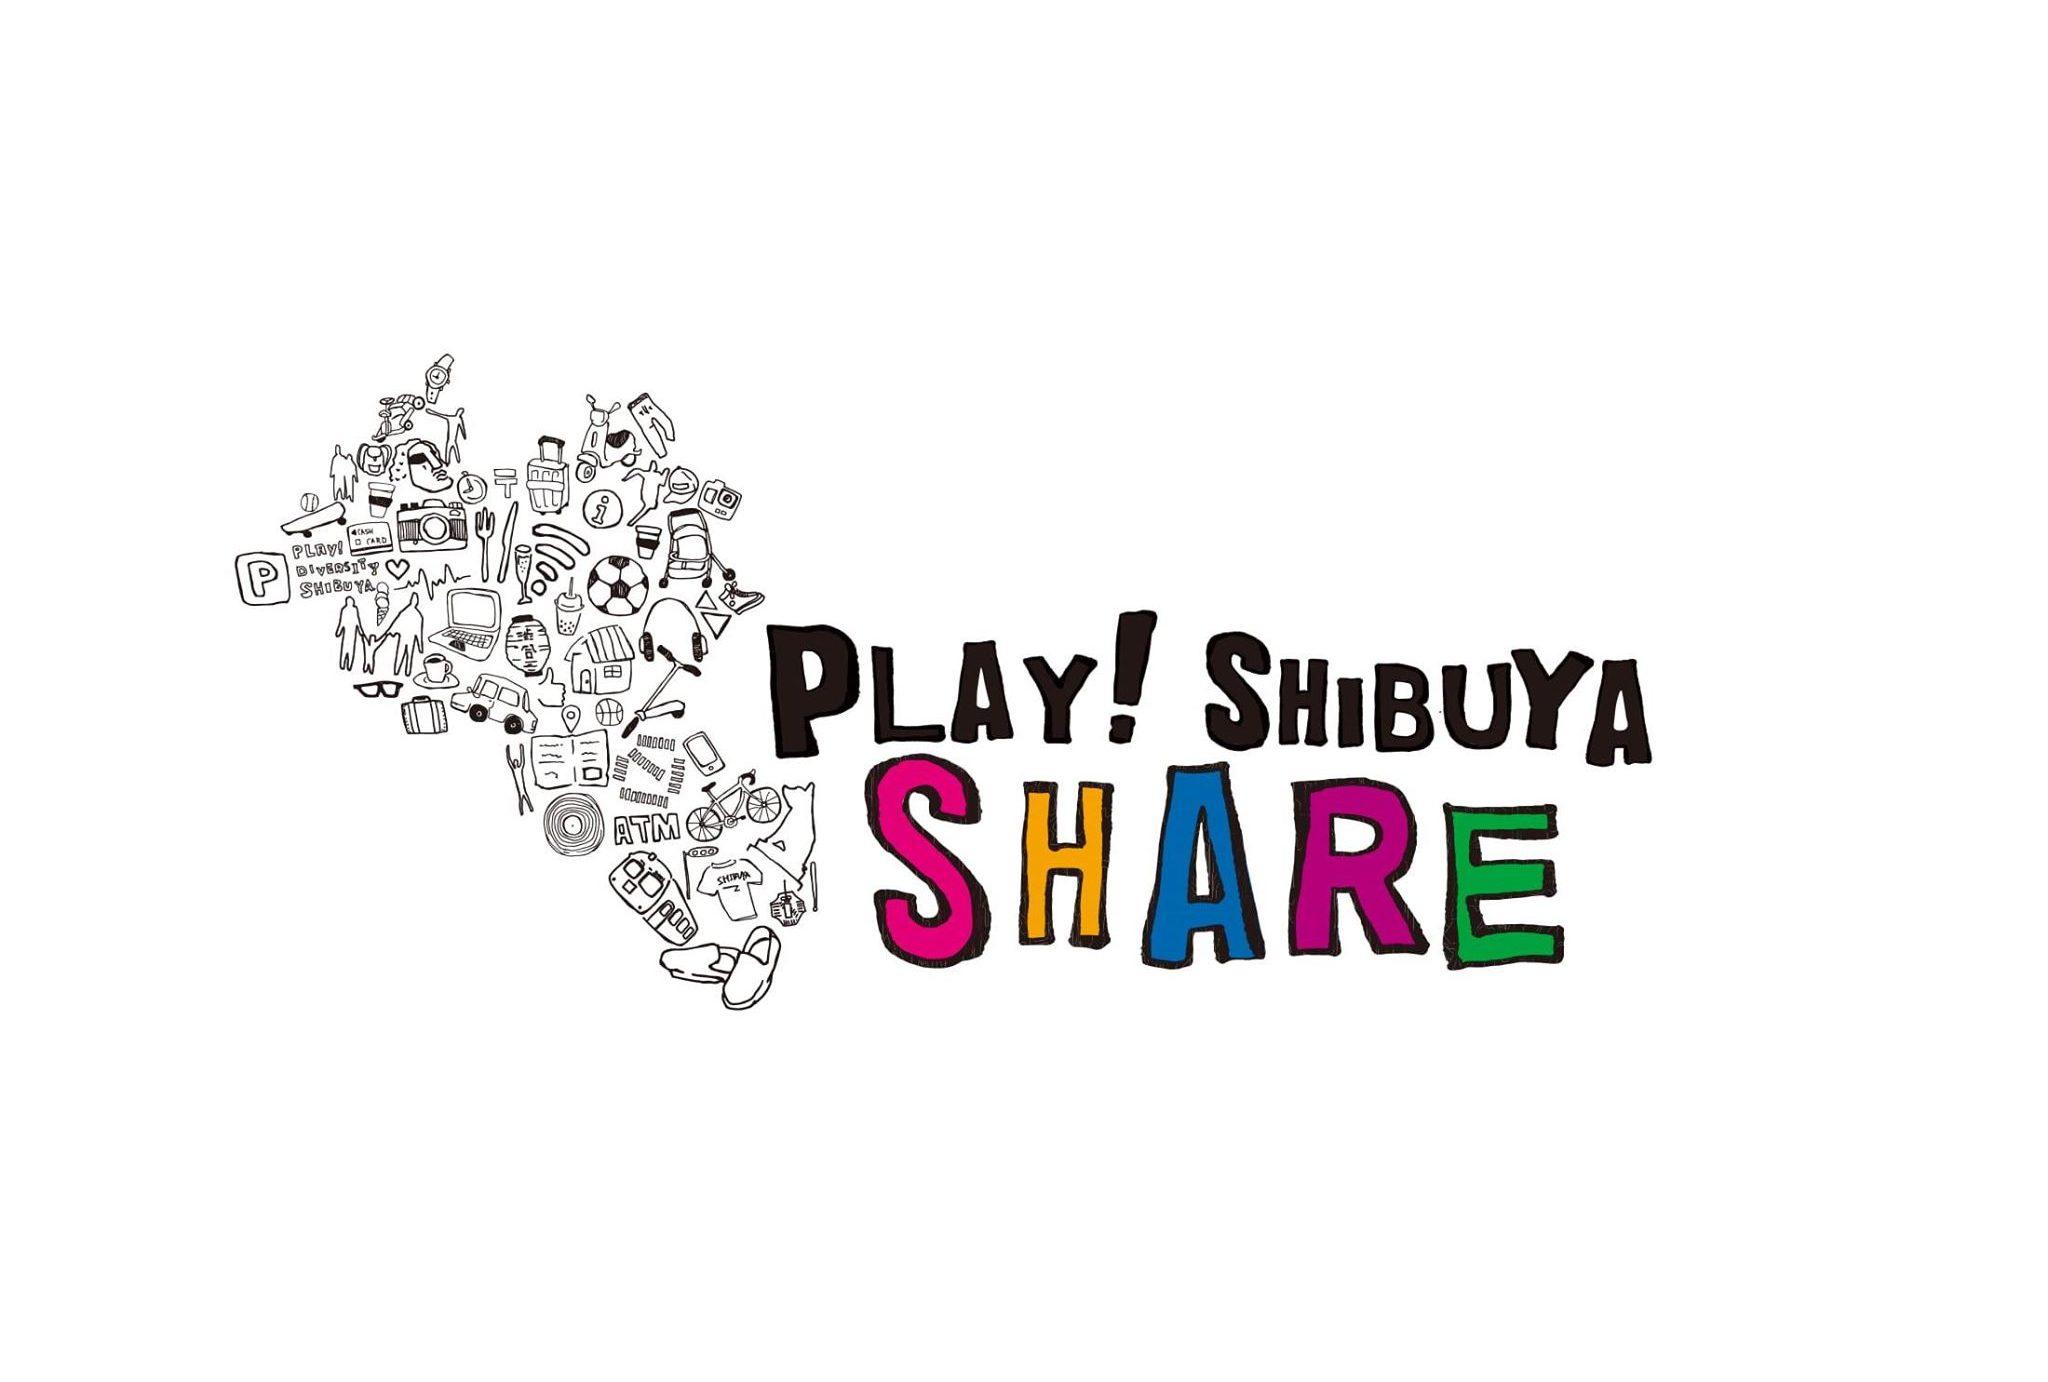 ecbo、渋谷区観光協会とシェアリングエコノミー協会の連携協定に参画!2020東京オリパラに向け増大する観光客に「手ぶら体験」を